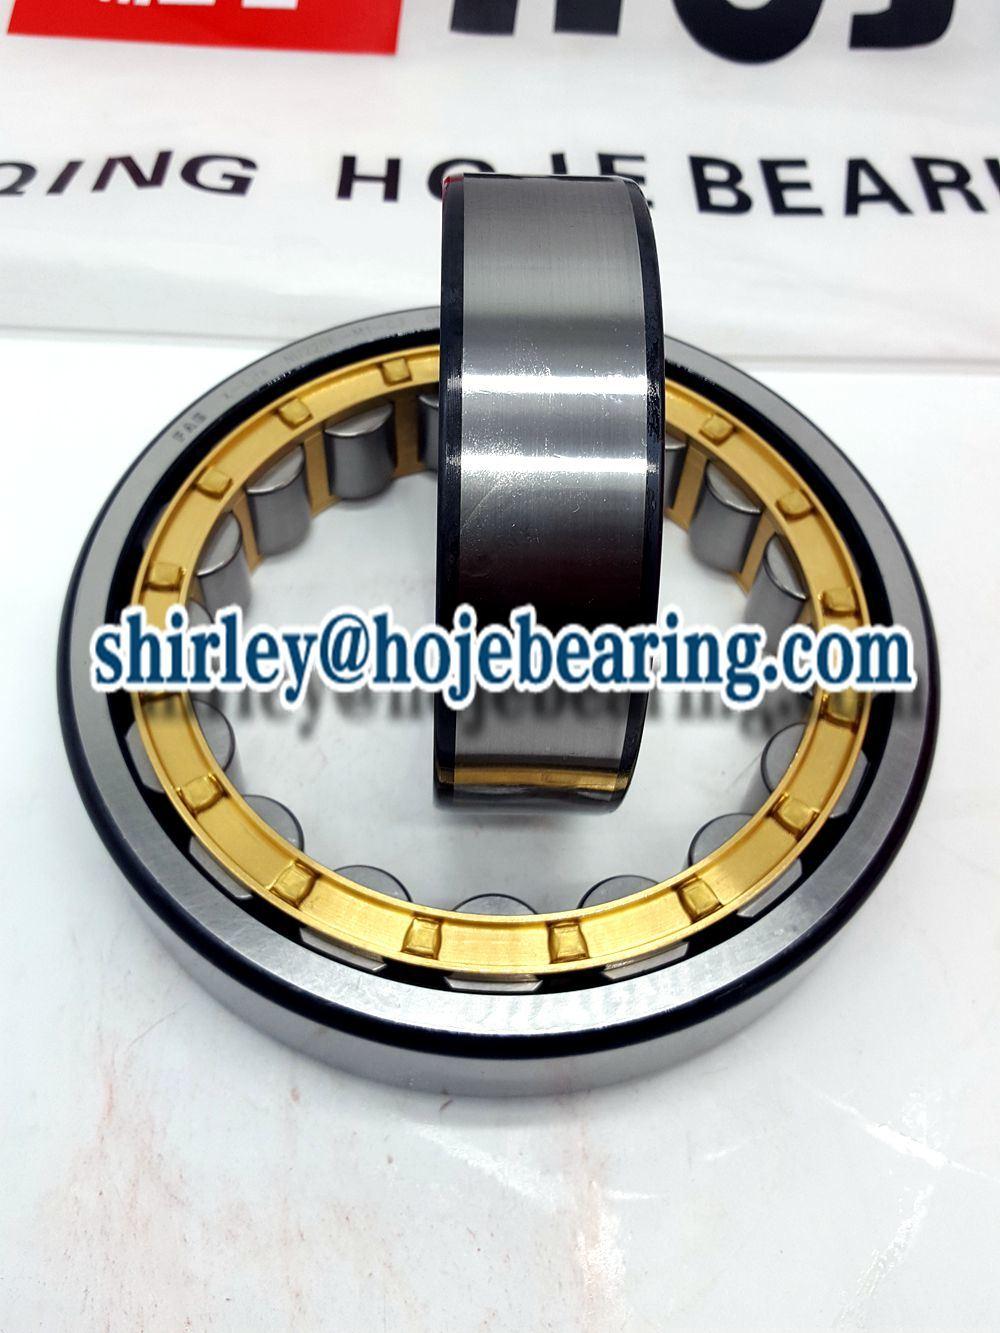 Chrome Steel Material Cylindical Roller Bearing Nu334, Nu2334, Nu234, Nj236